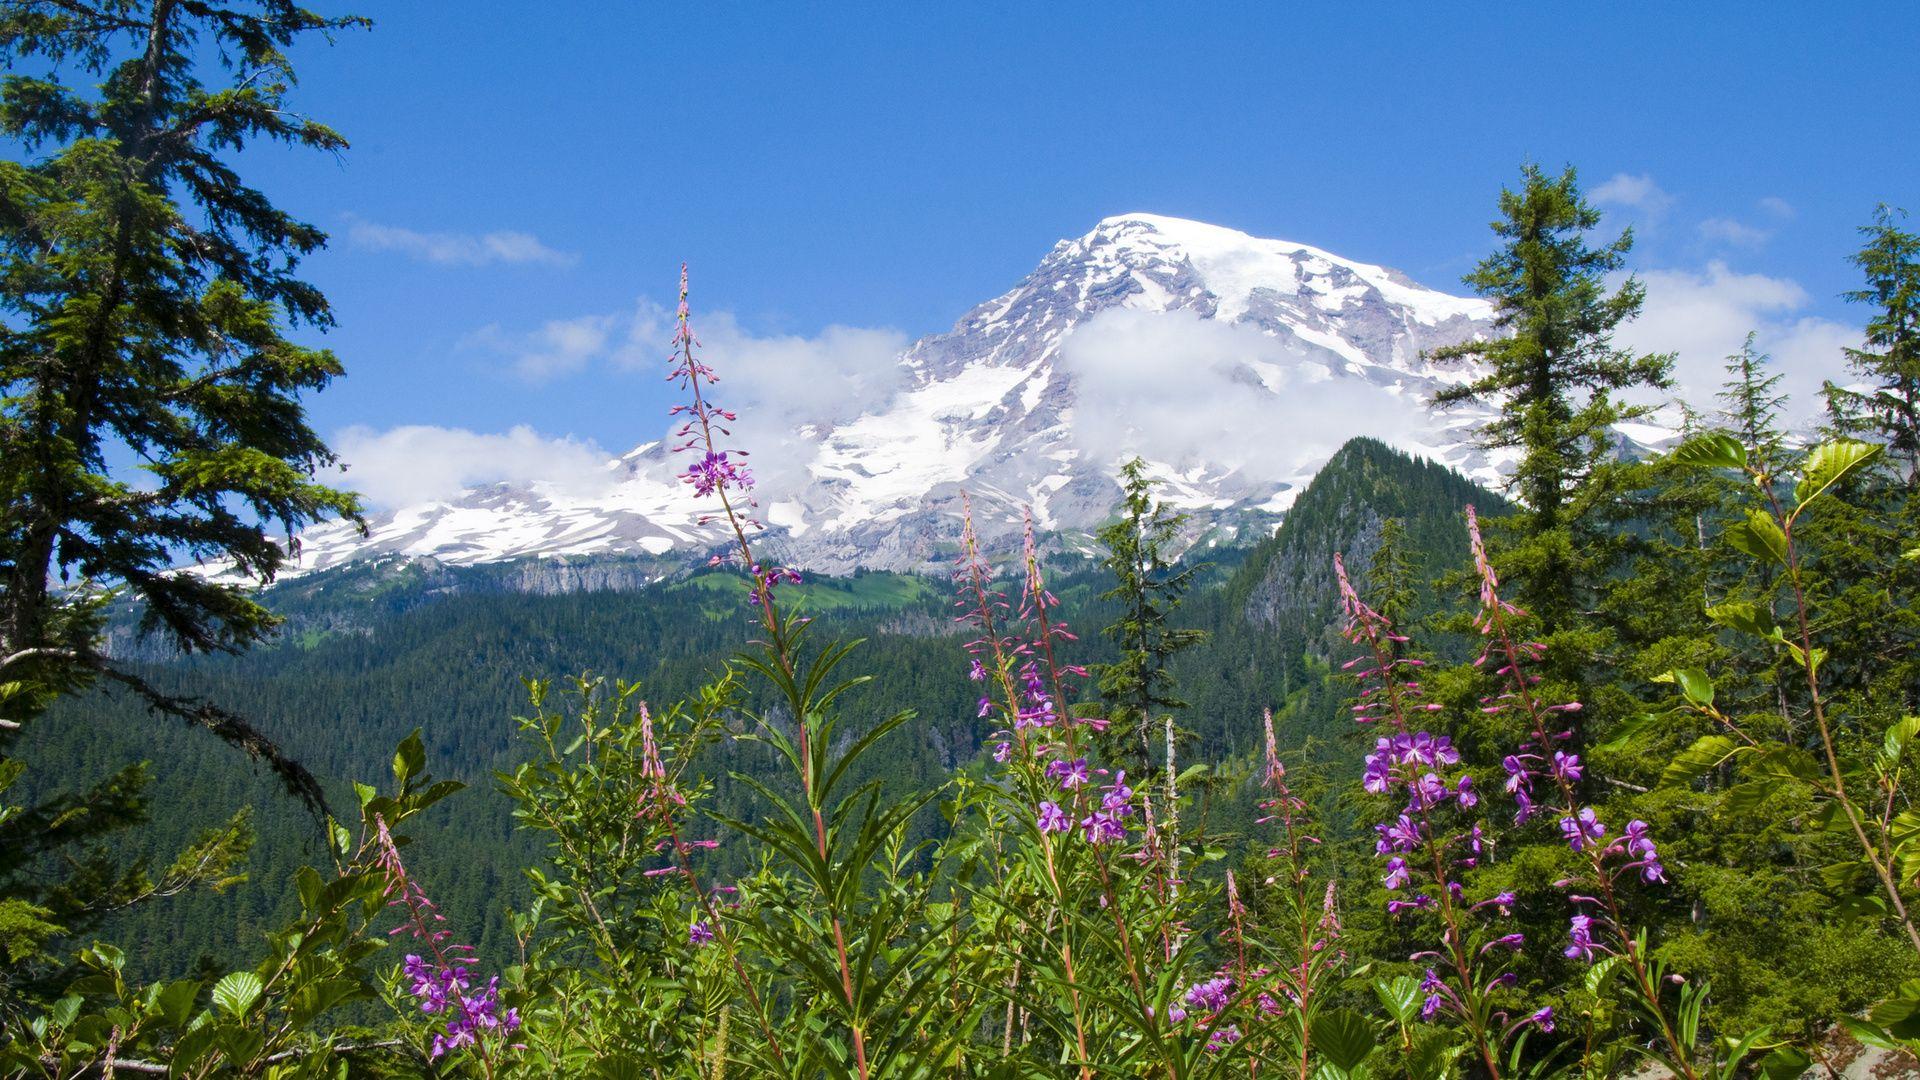 Wallpaper National parks, Rainier national park, Mount